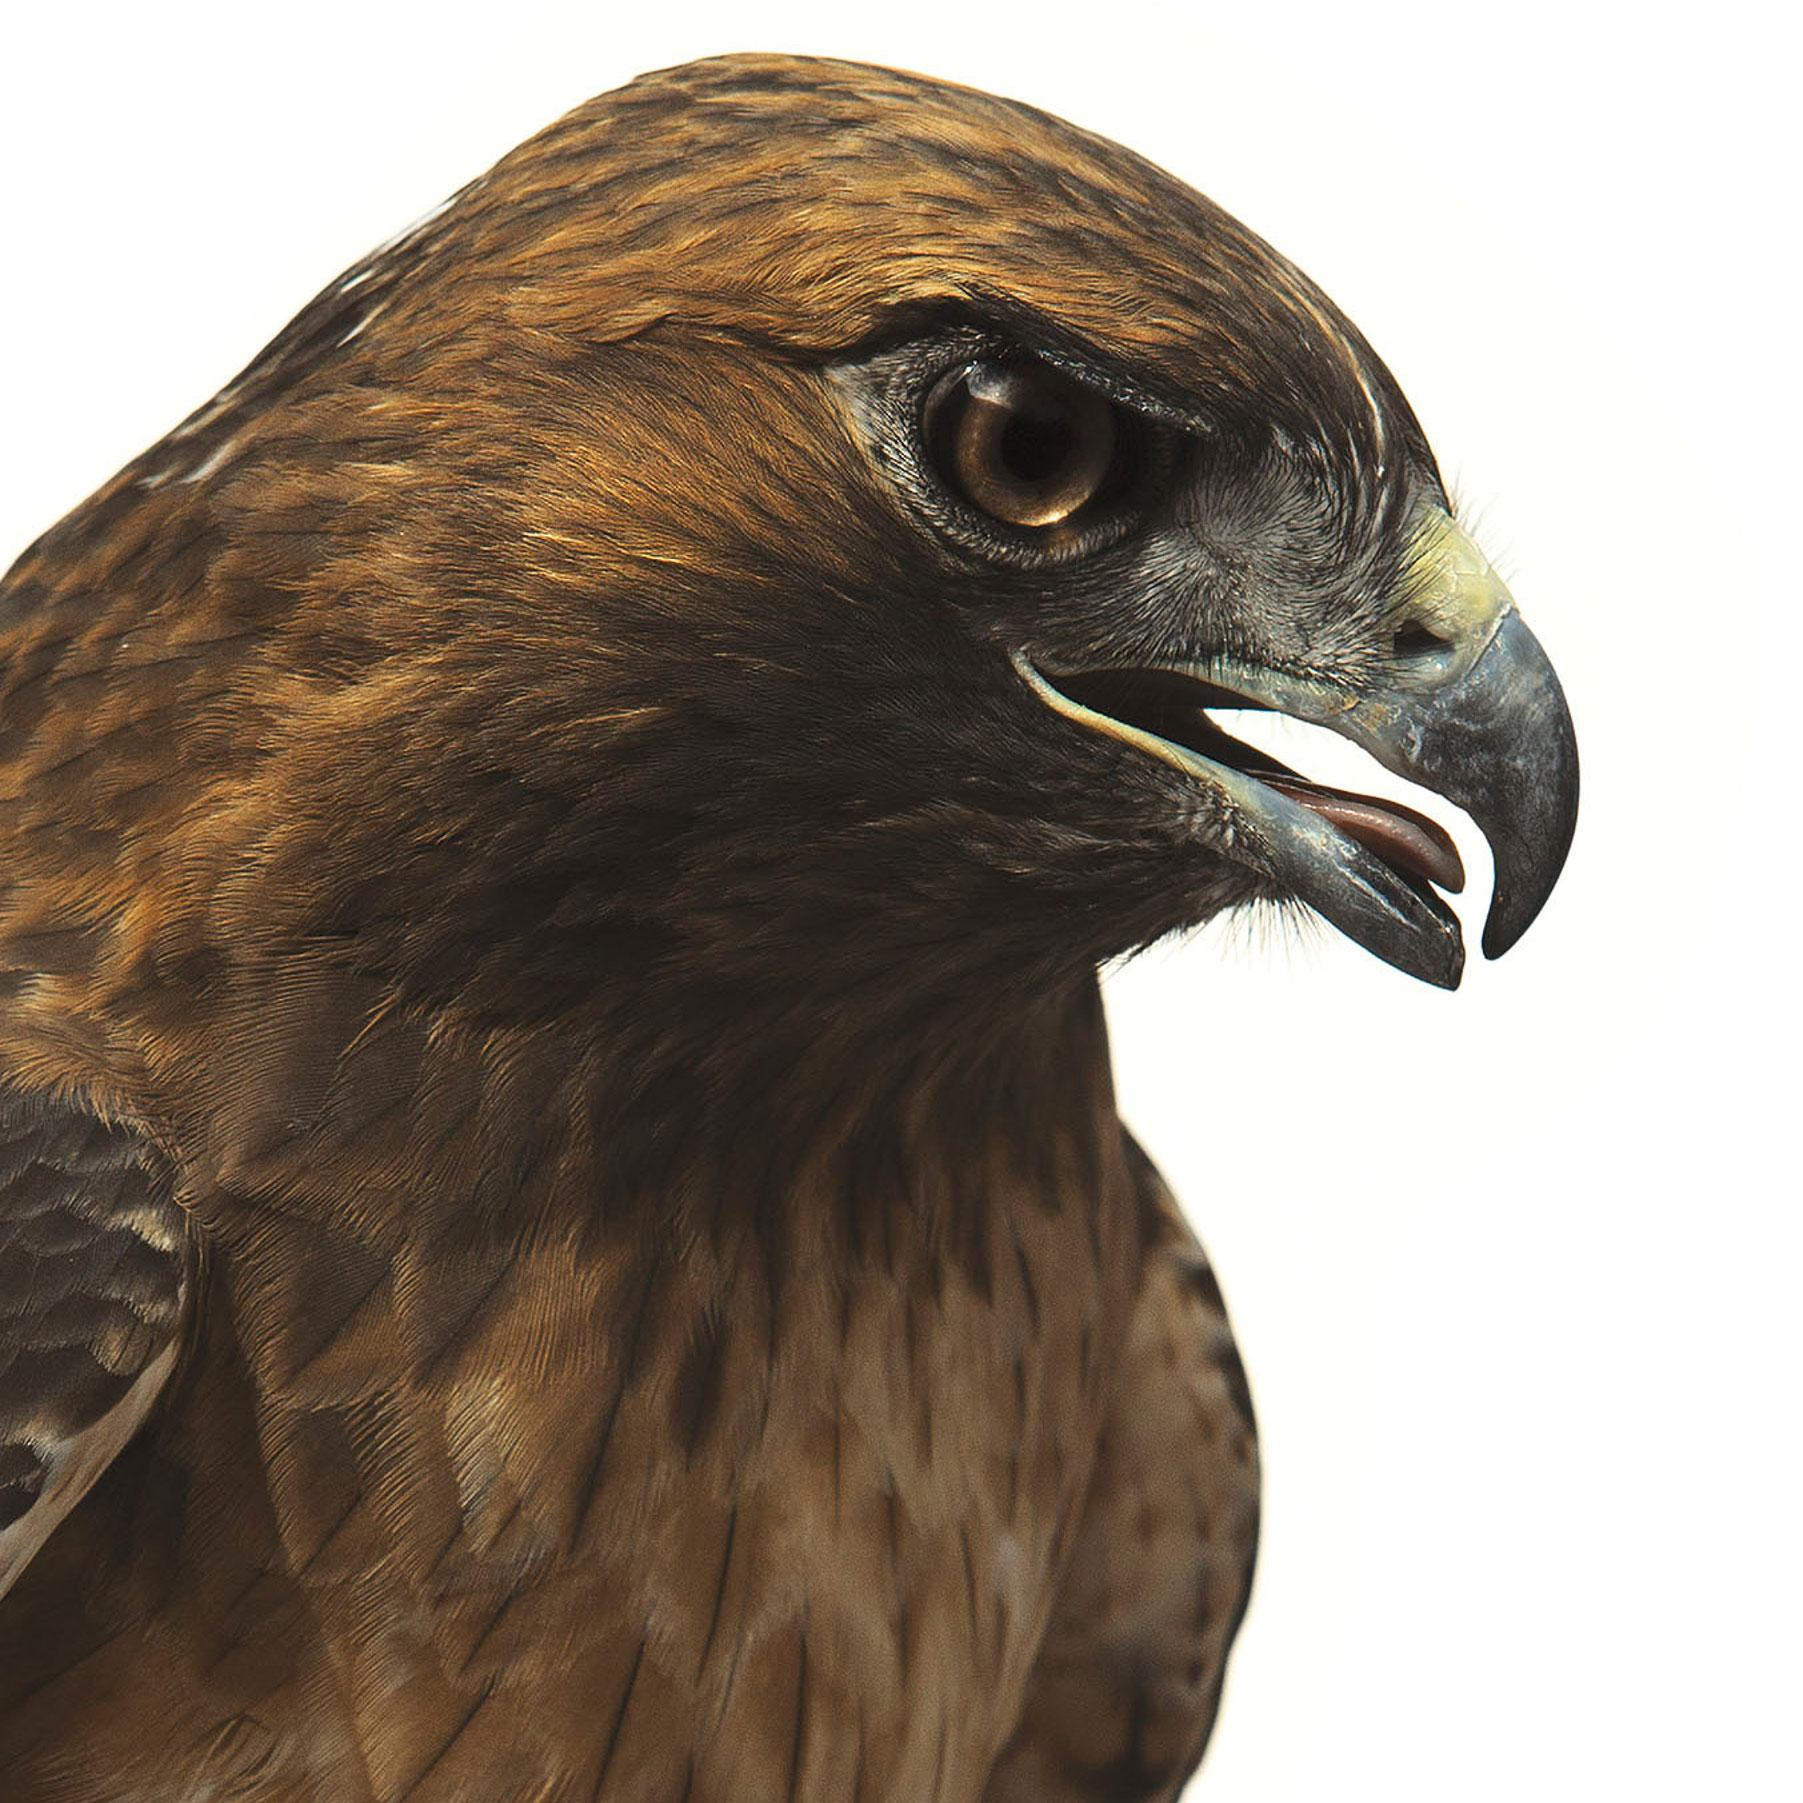 Red-tailed Hawk. Jennifer Maharry Maharry/Audubon Photography Awards